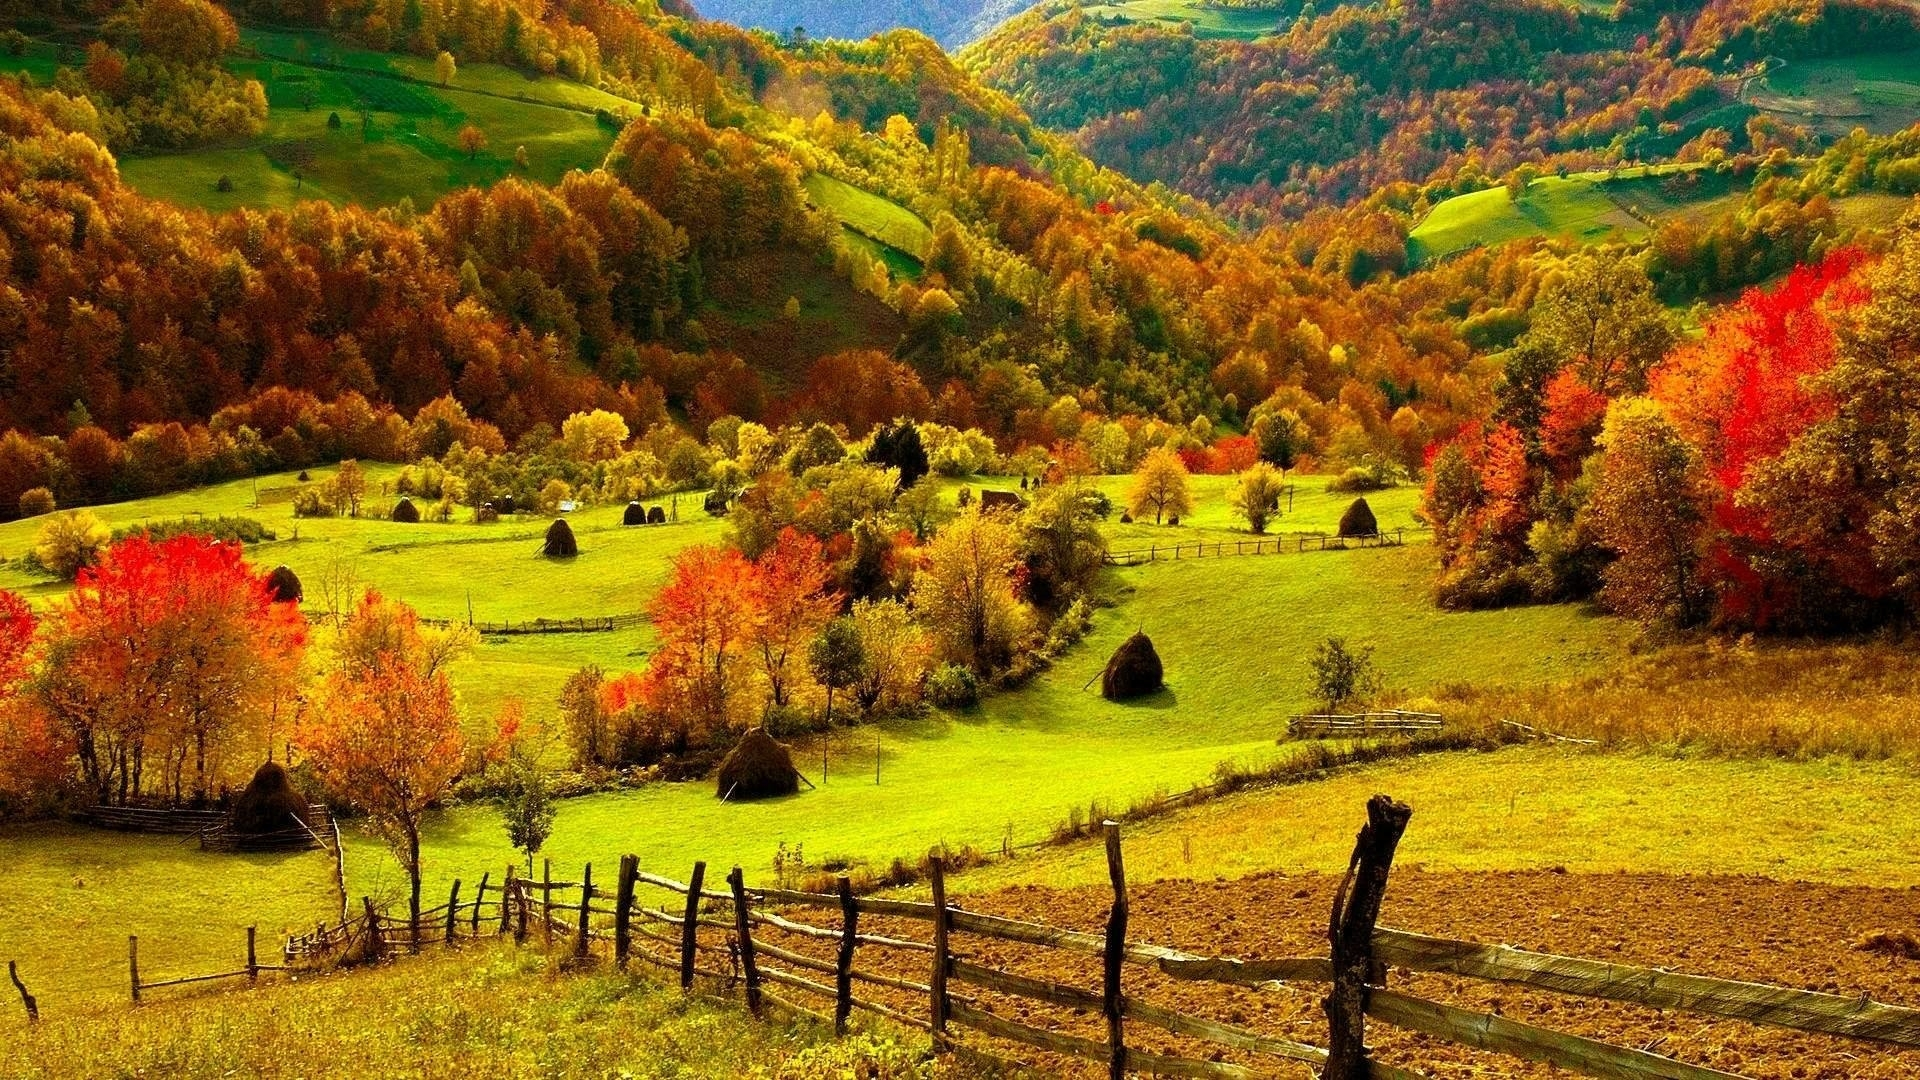 beautiful fall scenery wallpaper (49+ images)